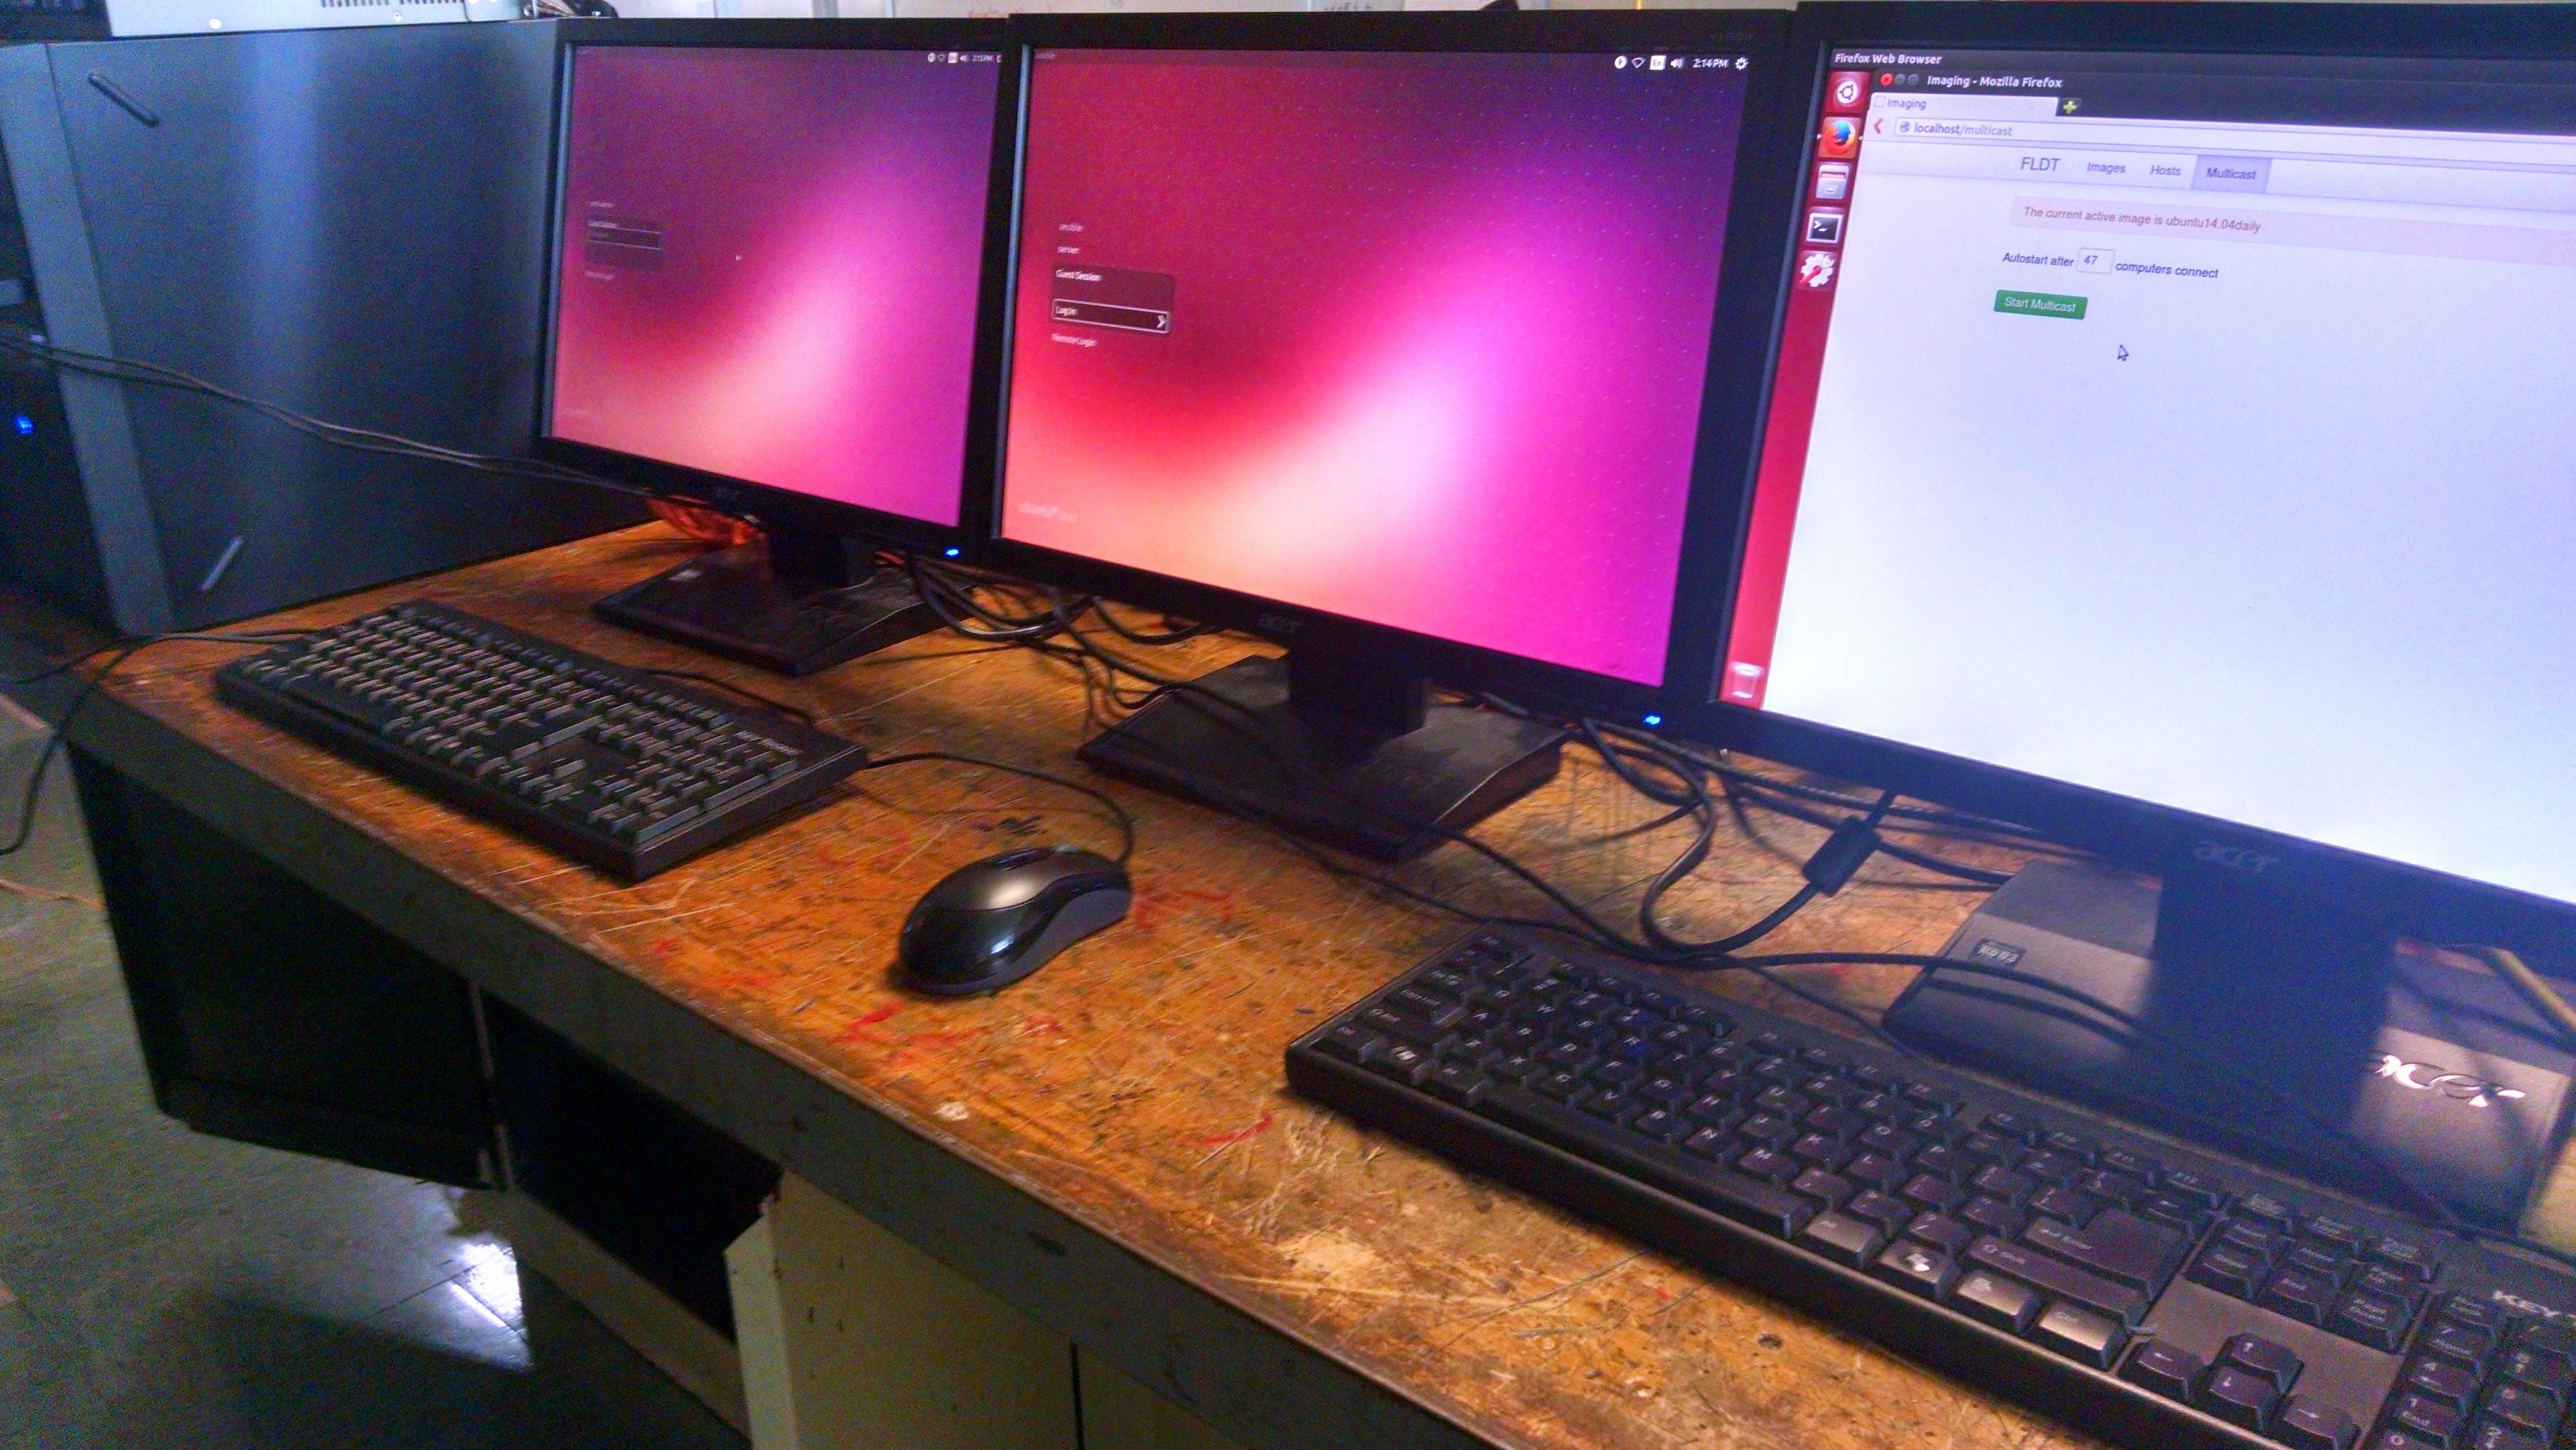 Ubuntu Imaging Stations